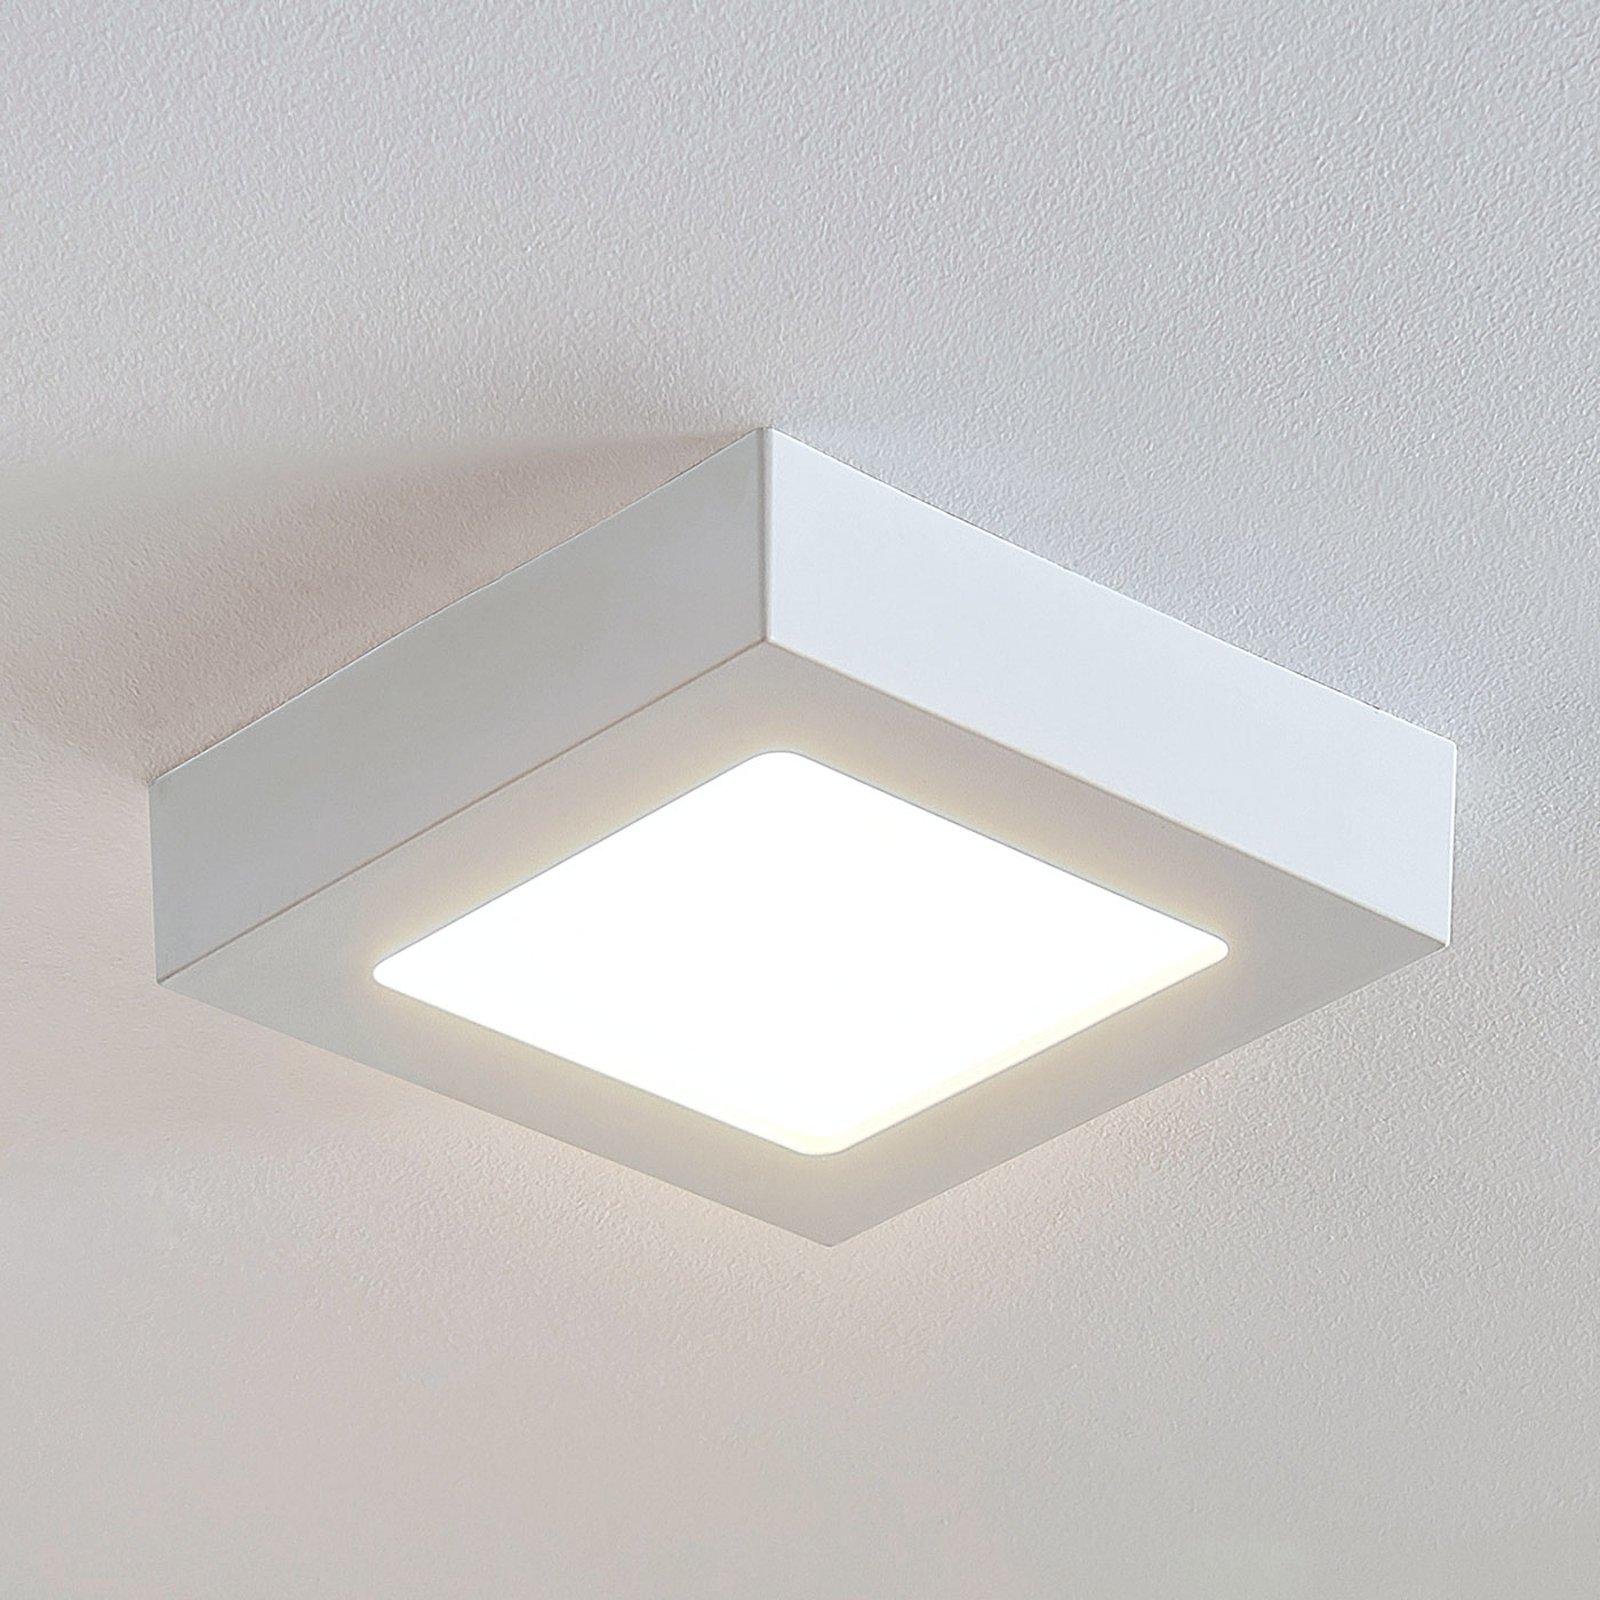 LED-taklampe Marlo, hvit, 3 000 K kantet 18,1 cm